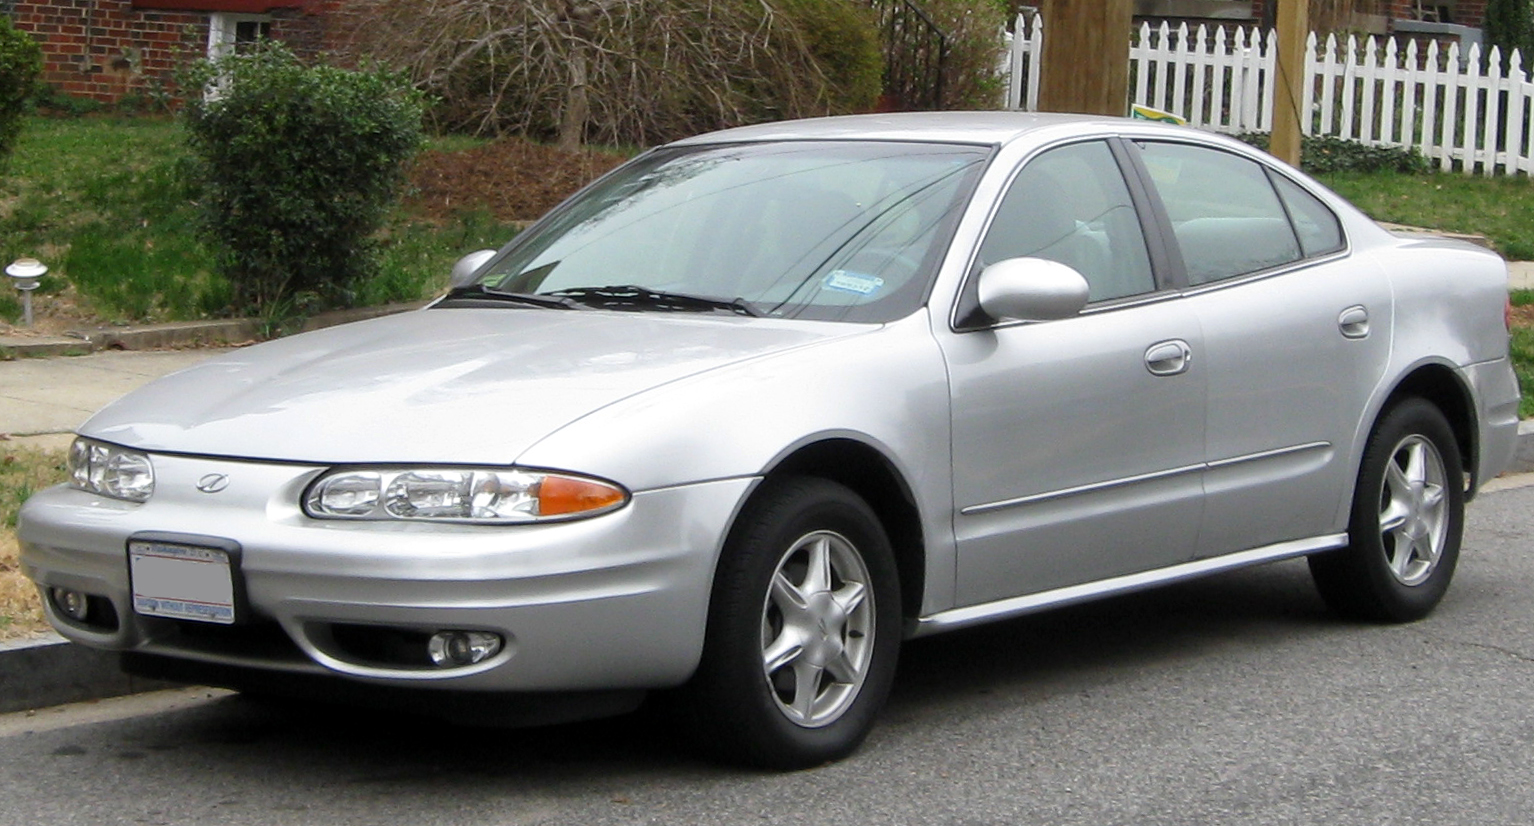 2002 Oldsmobile Alero - Information And Photos